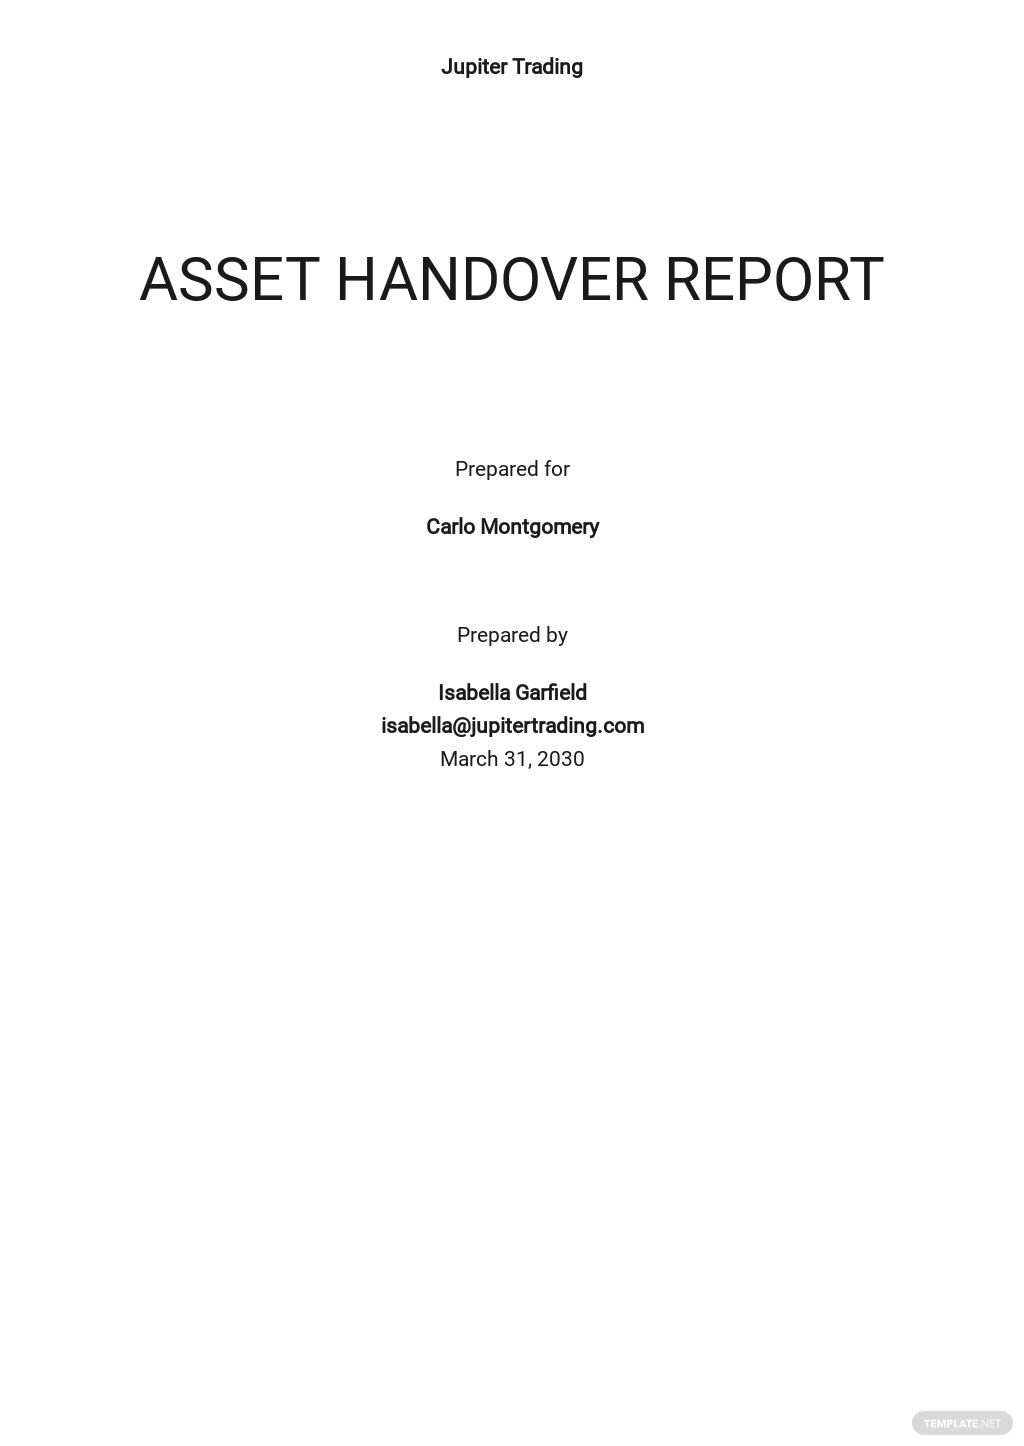 Free Asset Handover Report Template.jpe